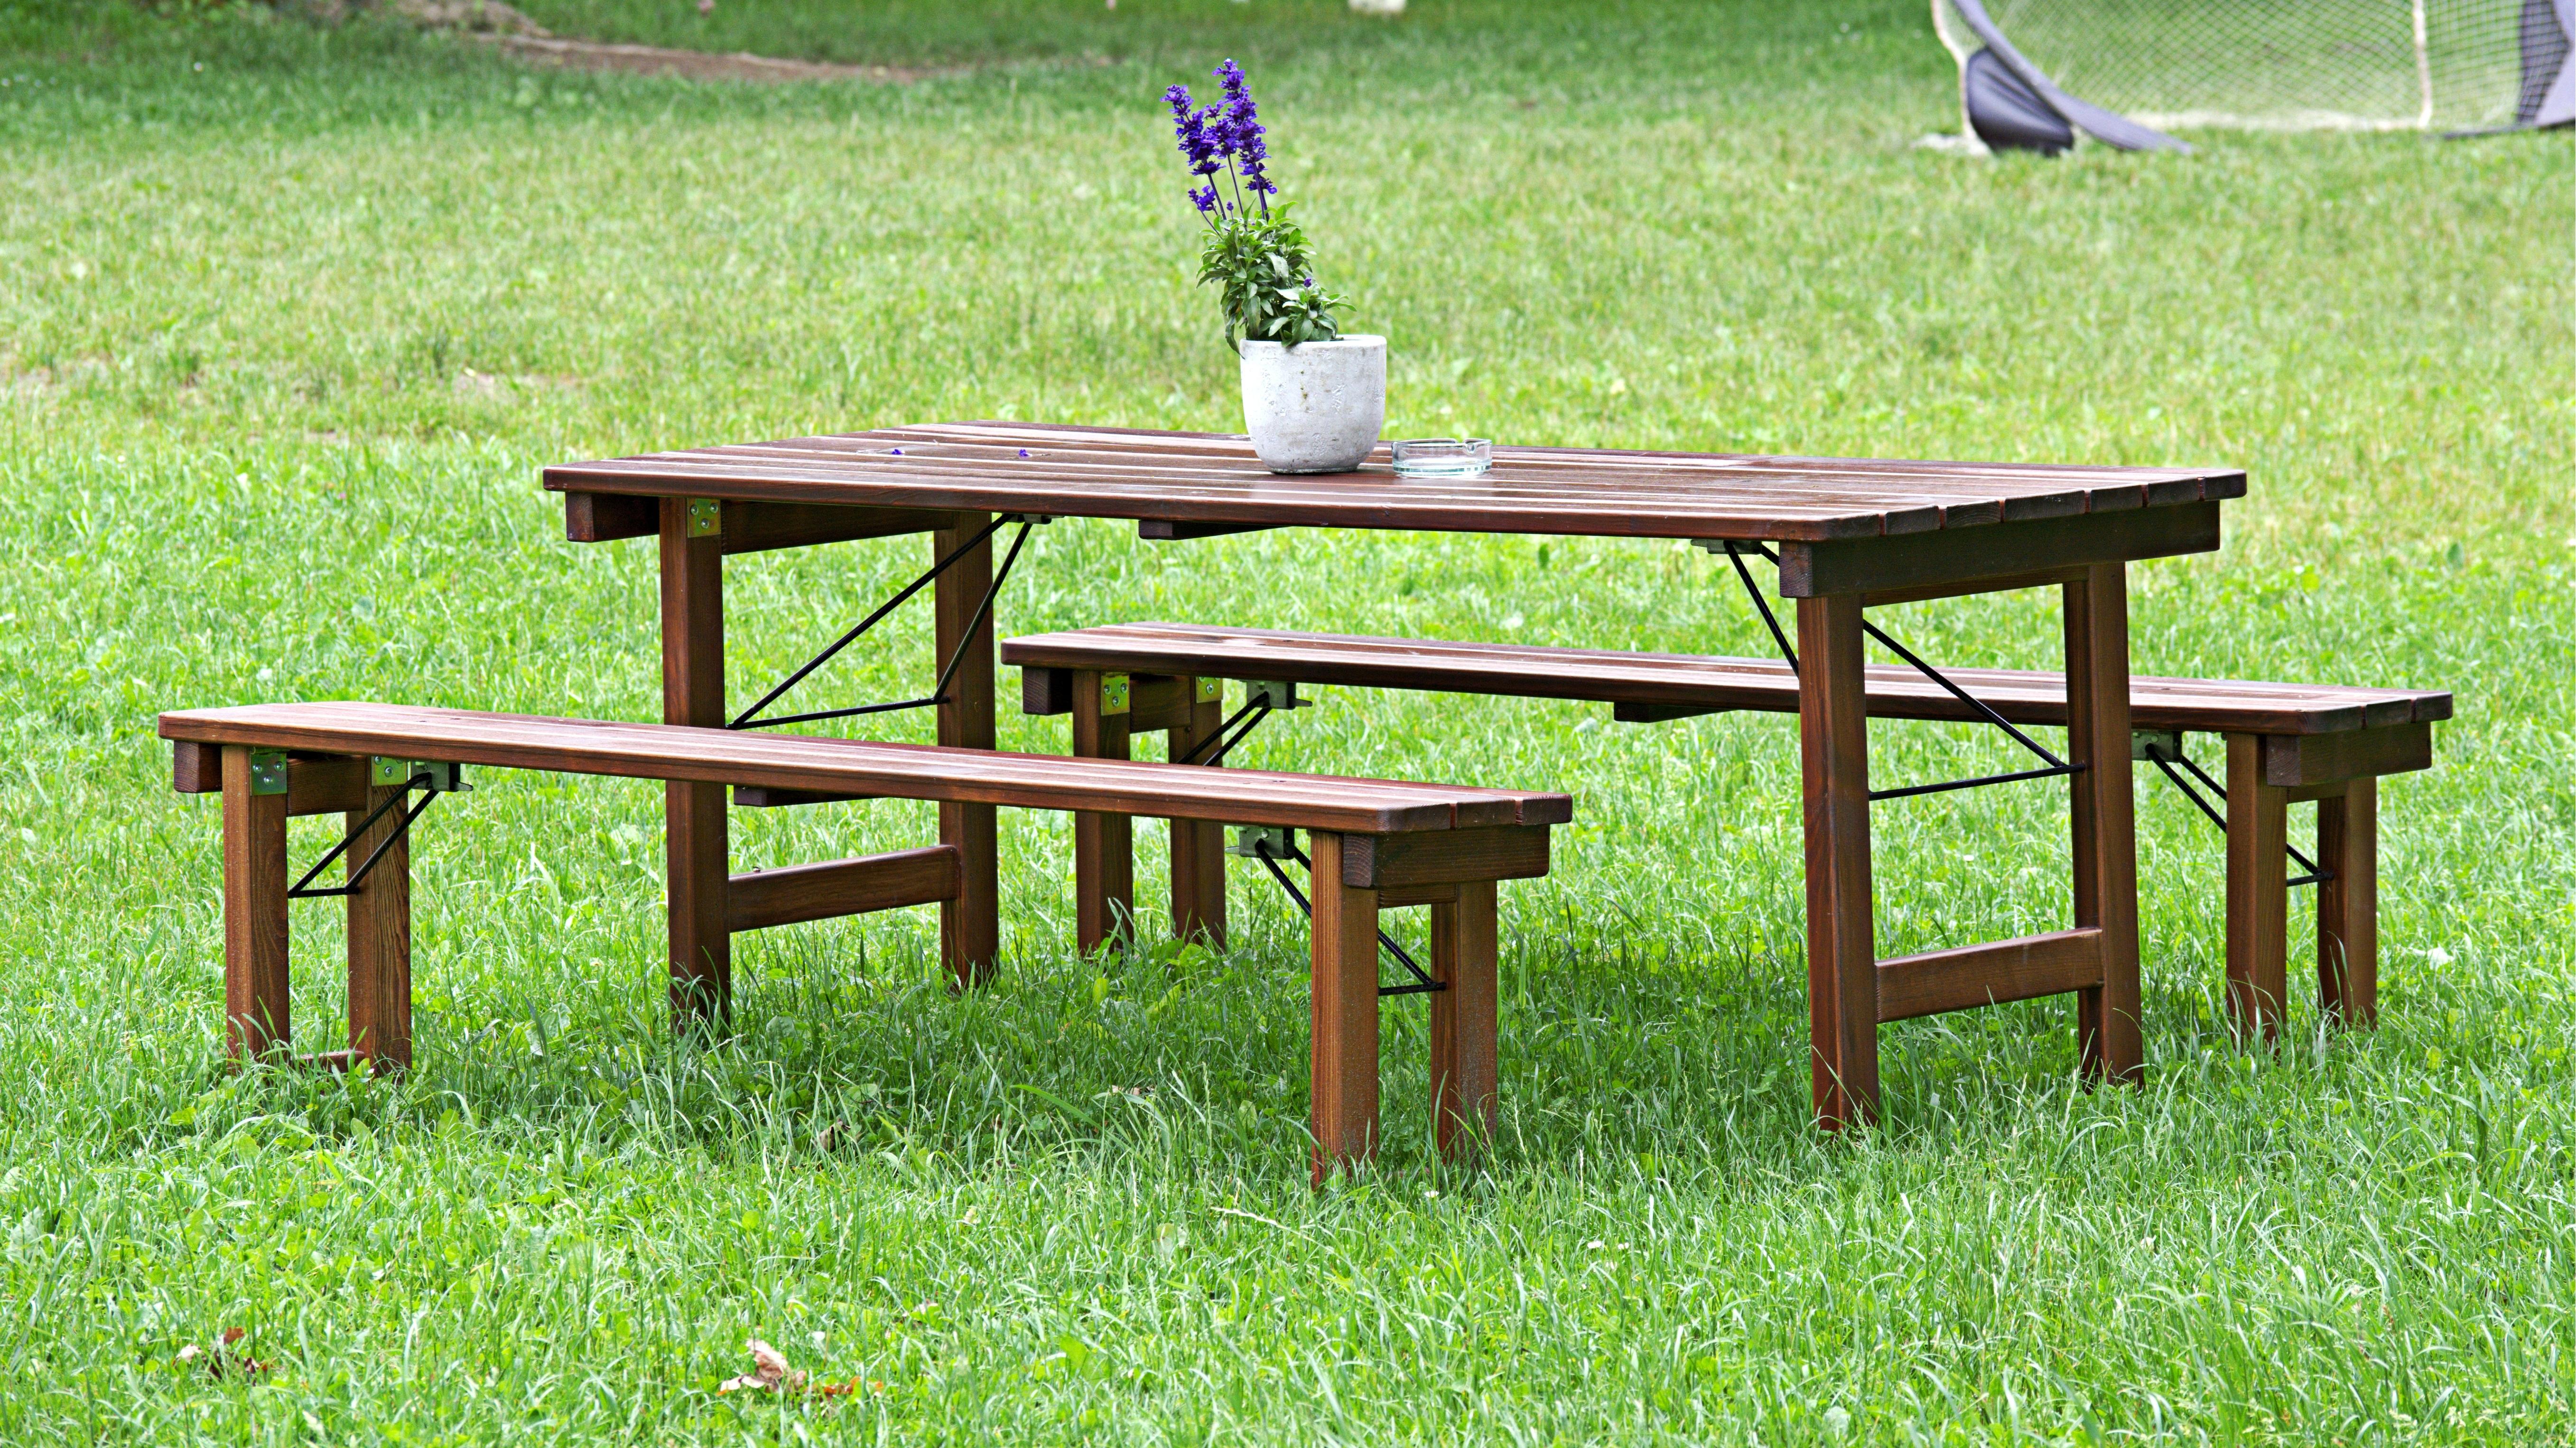 kostenlose foto tabelle natur holz bank sessel sitz rustikal entspannen sie sich sich. Black Bedroom Furniture Sets. Home Design Ideas